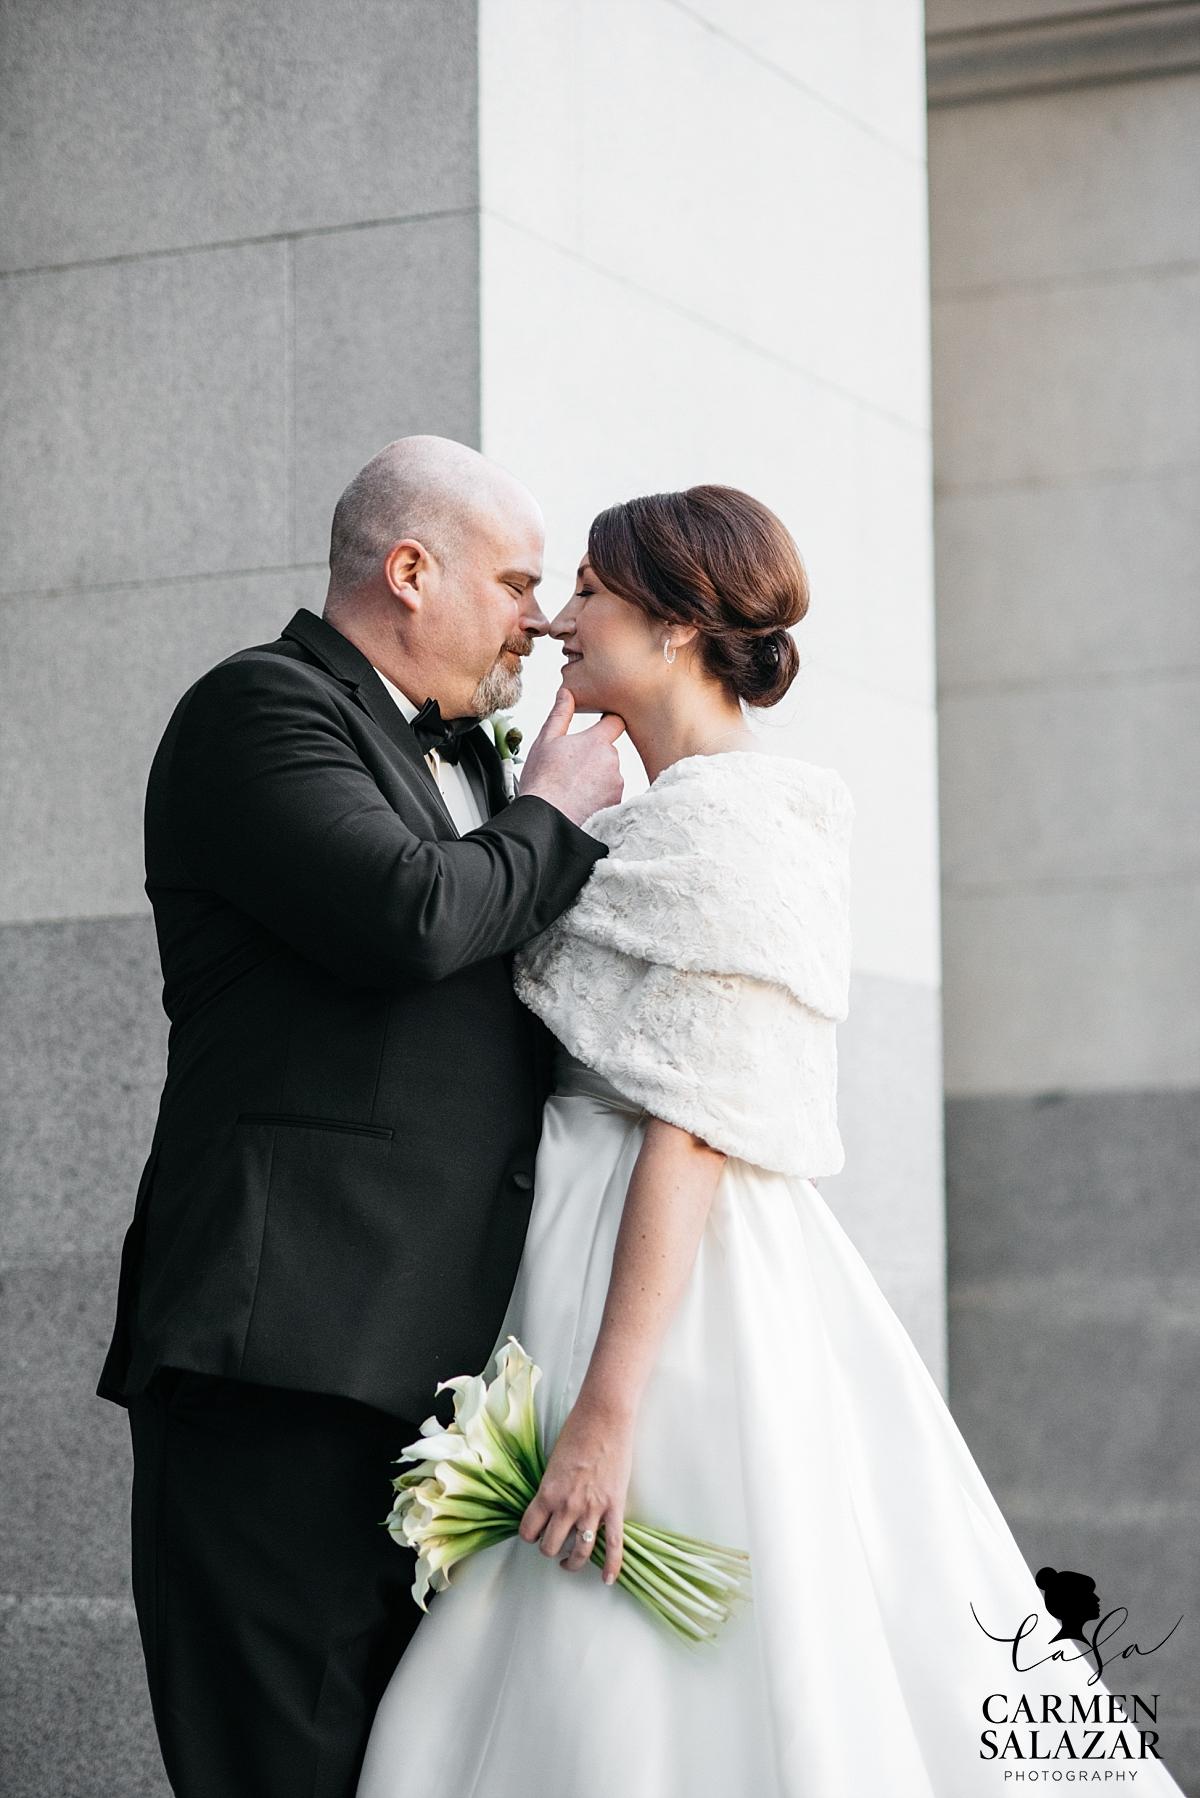 Bride and groom lovingly embrace - Carmen Salazar